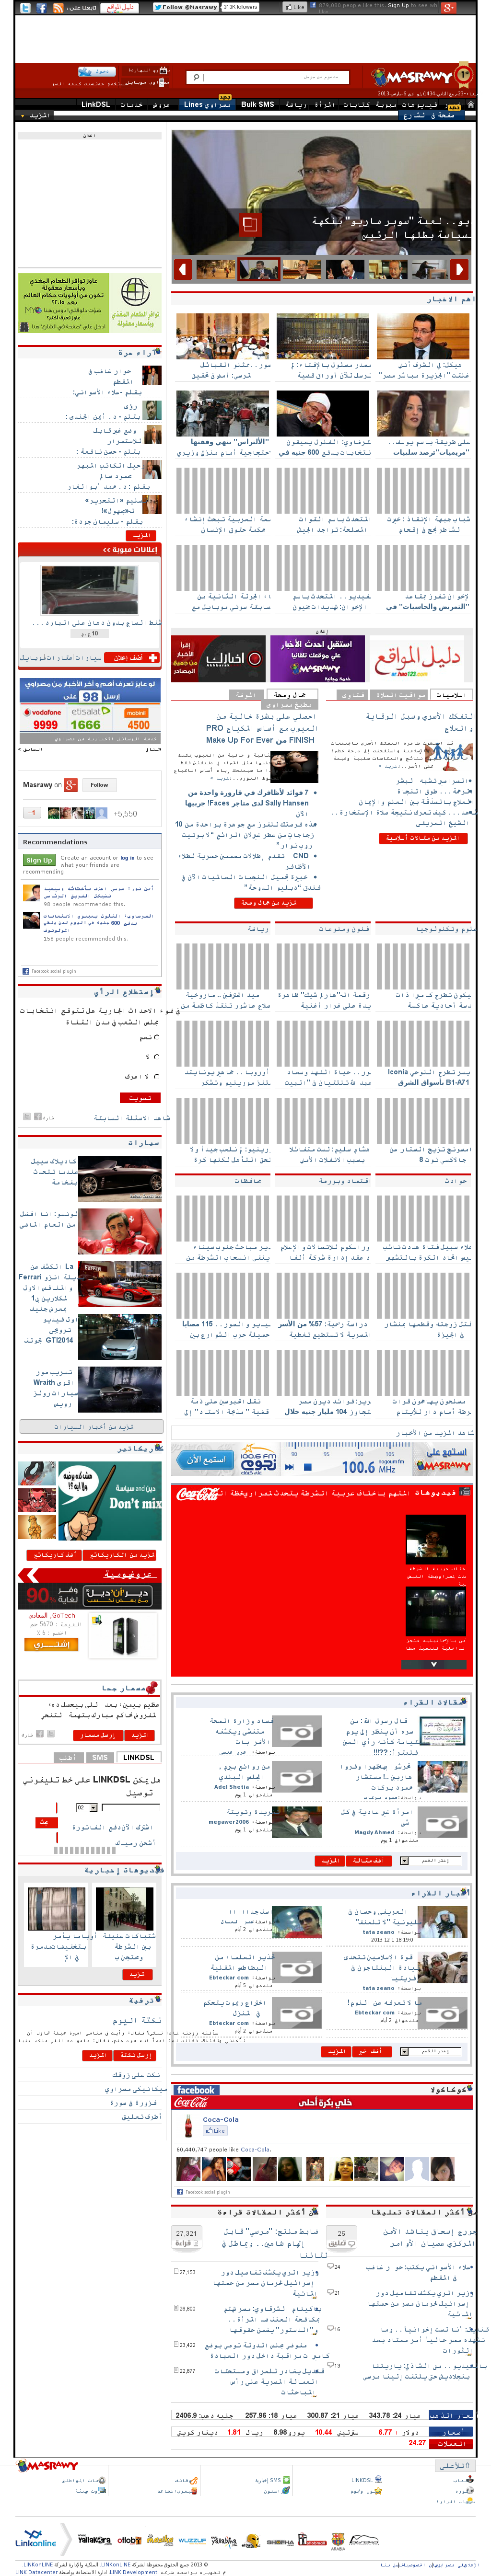 Masrawy at Wednesday March 6, 2013, 5:12 a.m. UTC